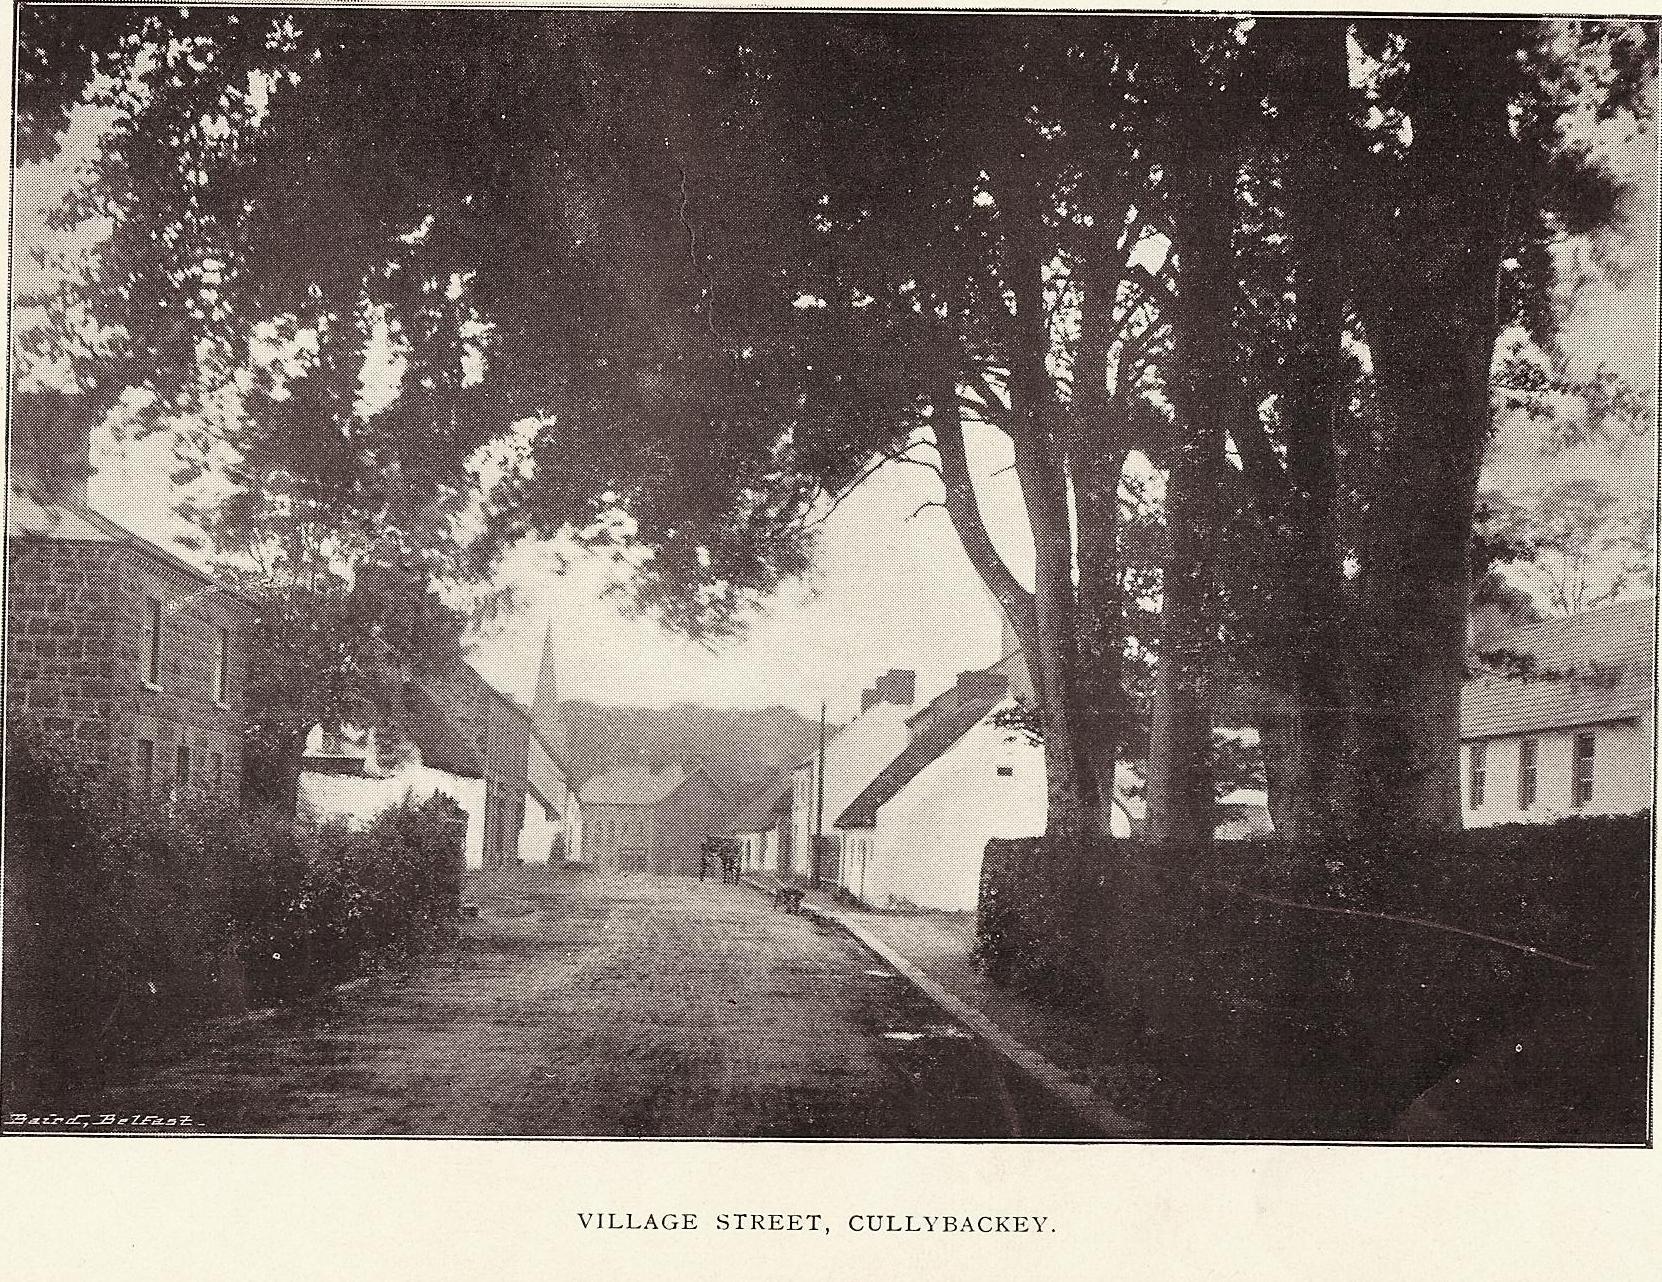 village-street-cullybackey-old